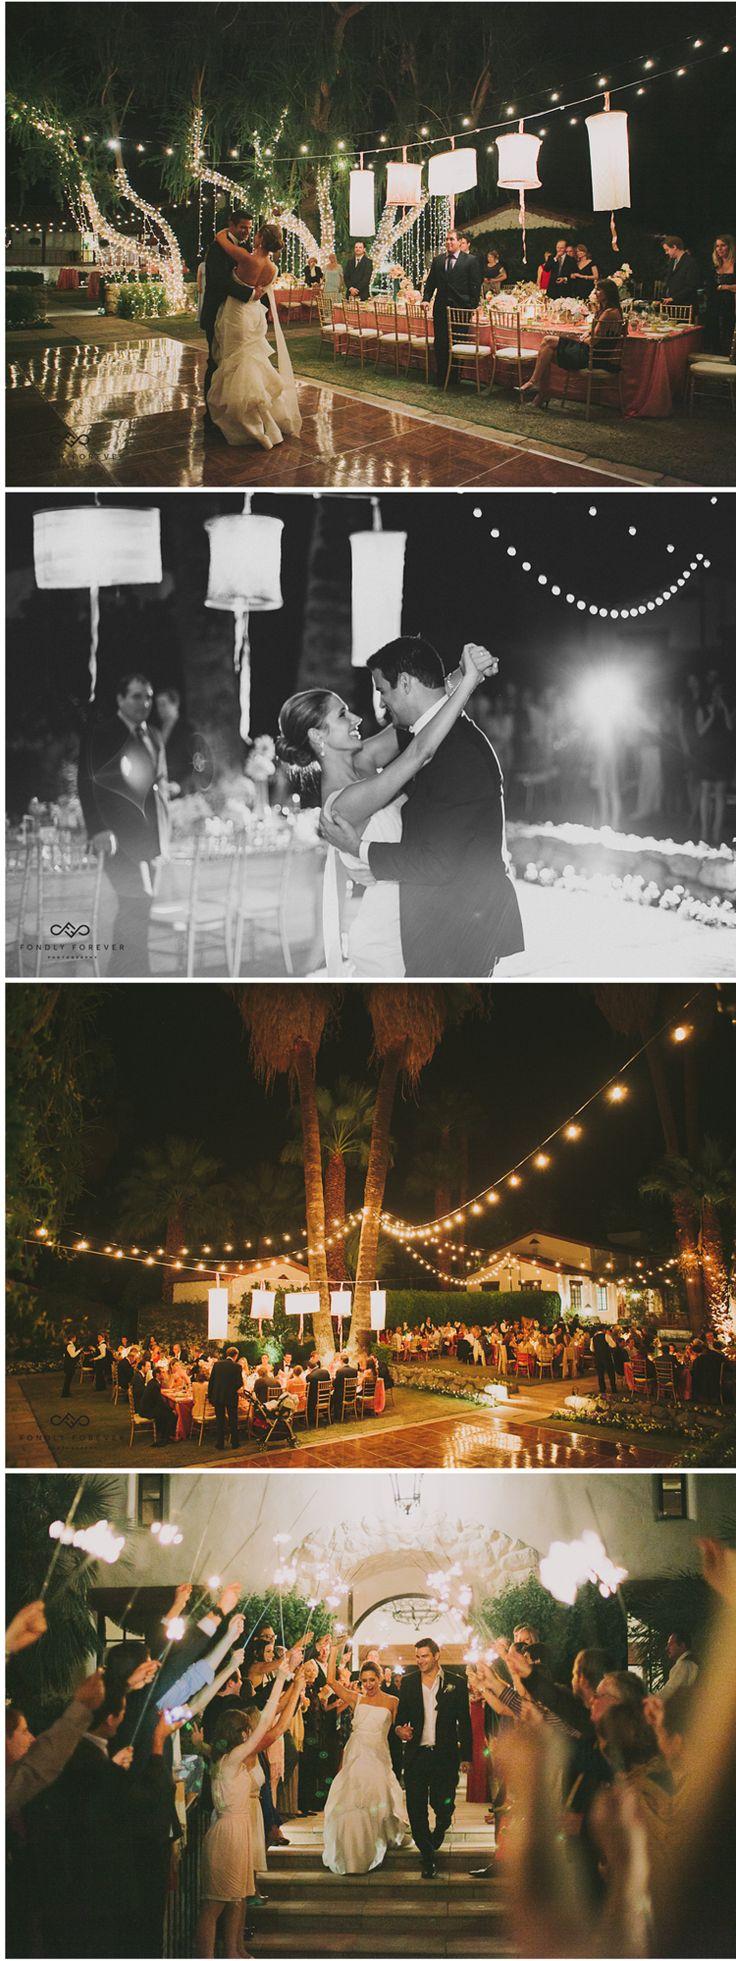 Romantic Palm Springs Wedding Keywords: #springweddings #weddinglighting #jevelweddingplanning Follow Us: www.jevelweddingplanning.com  www.facebook.com/jevelweddingplanning/